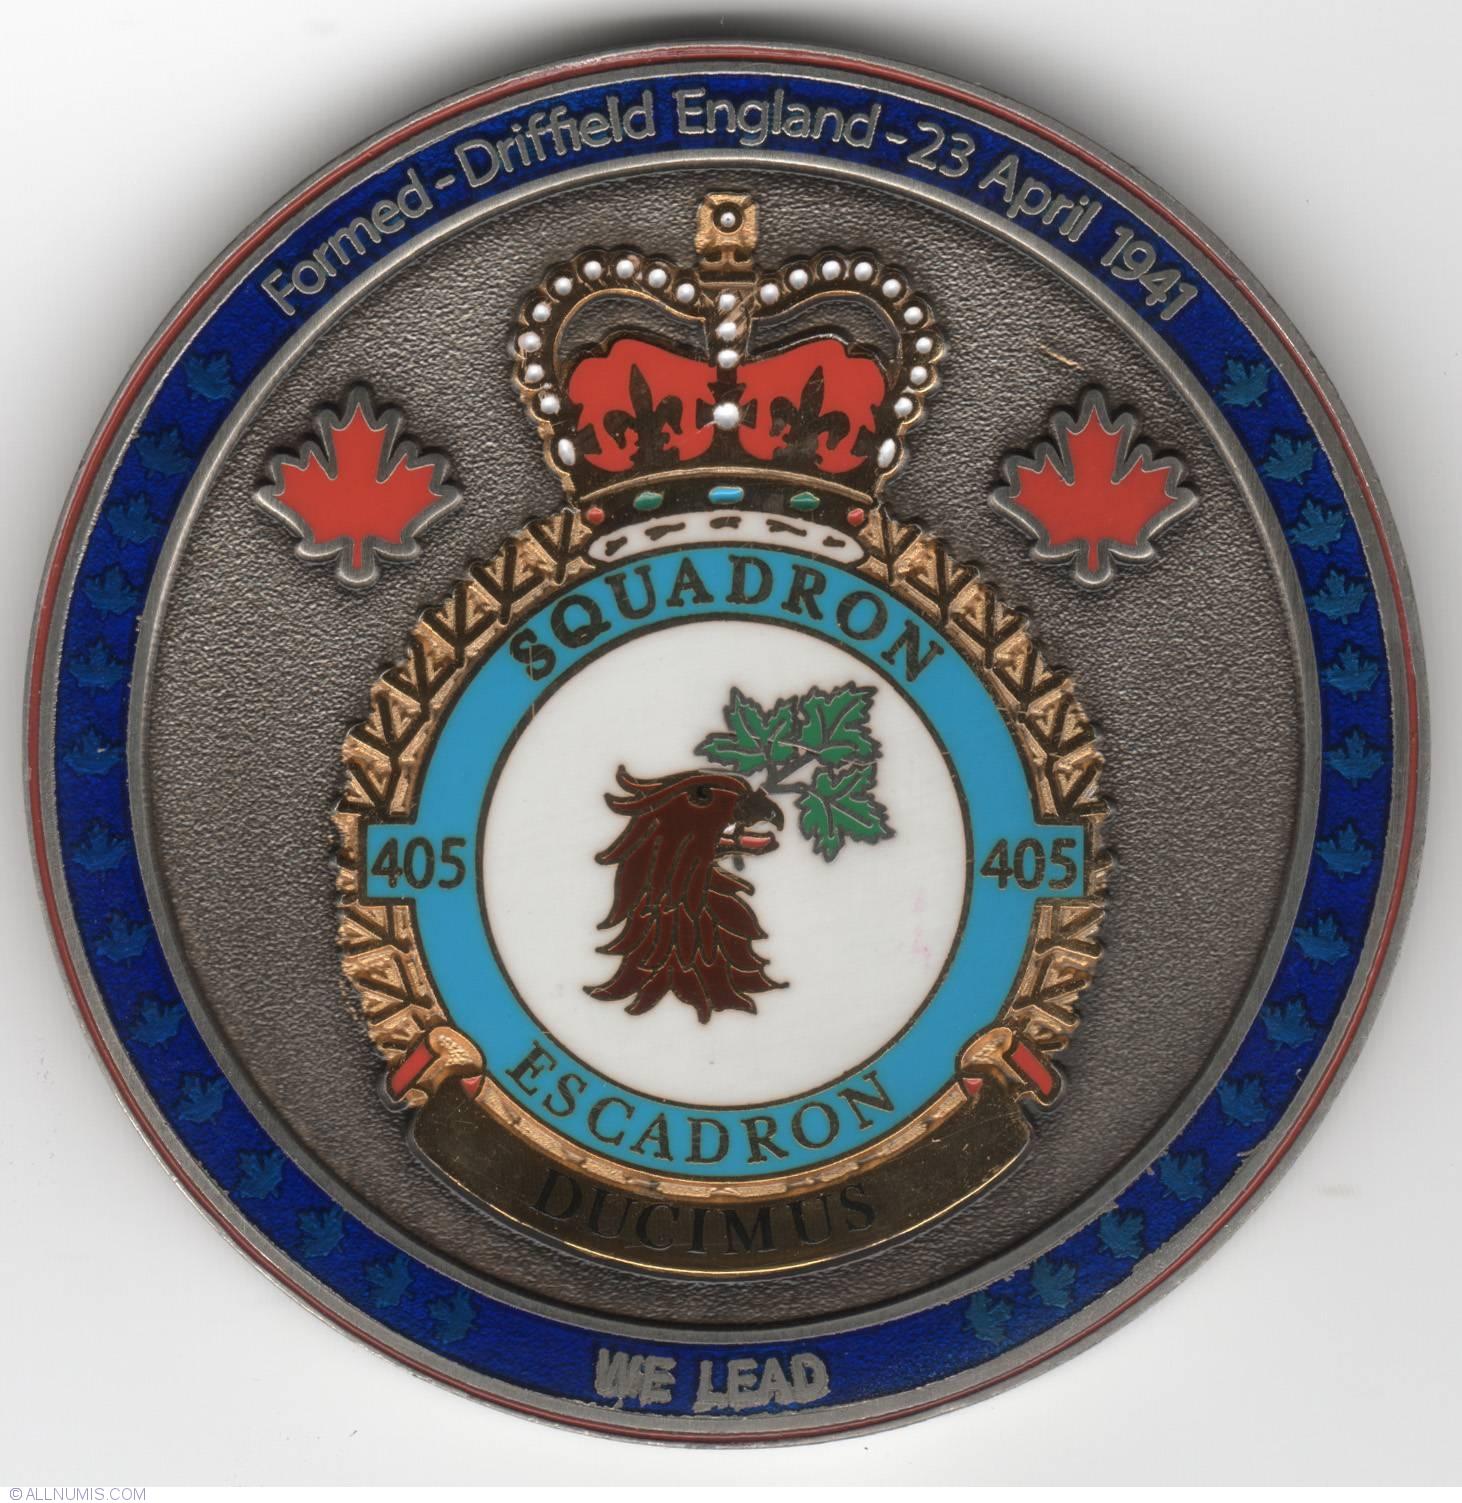 No. 405 Squadron RCAF